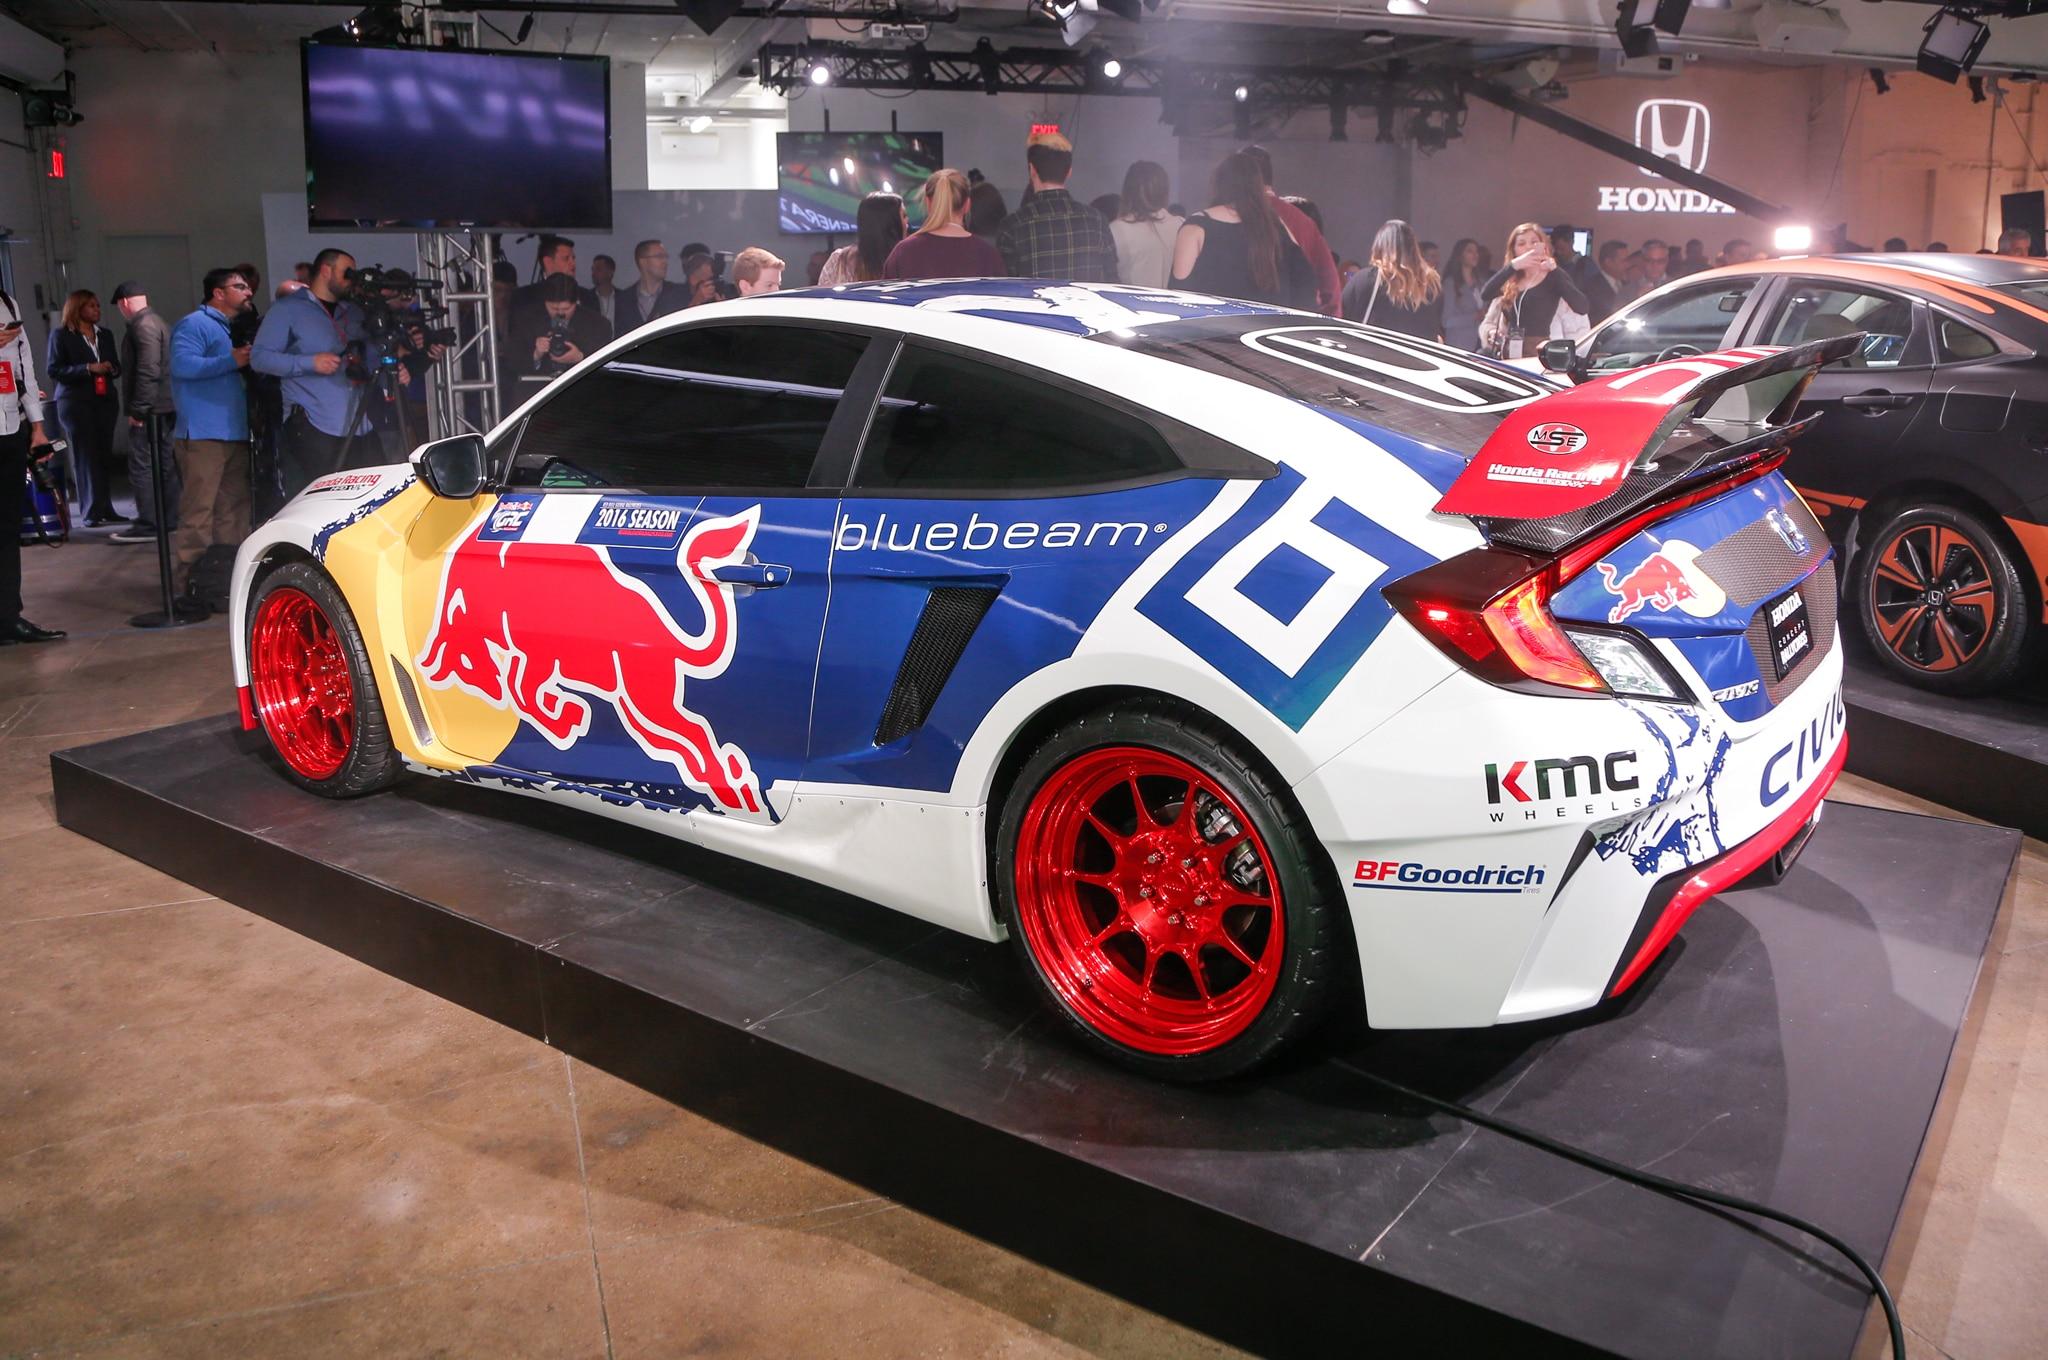 2016 honda civic coupe global rallycross racing car revealed